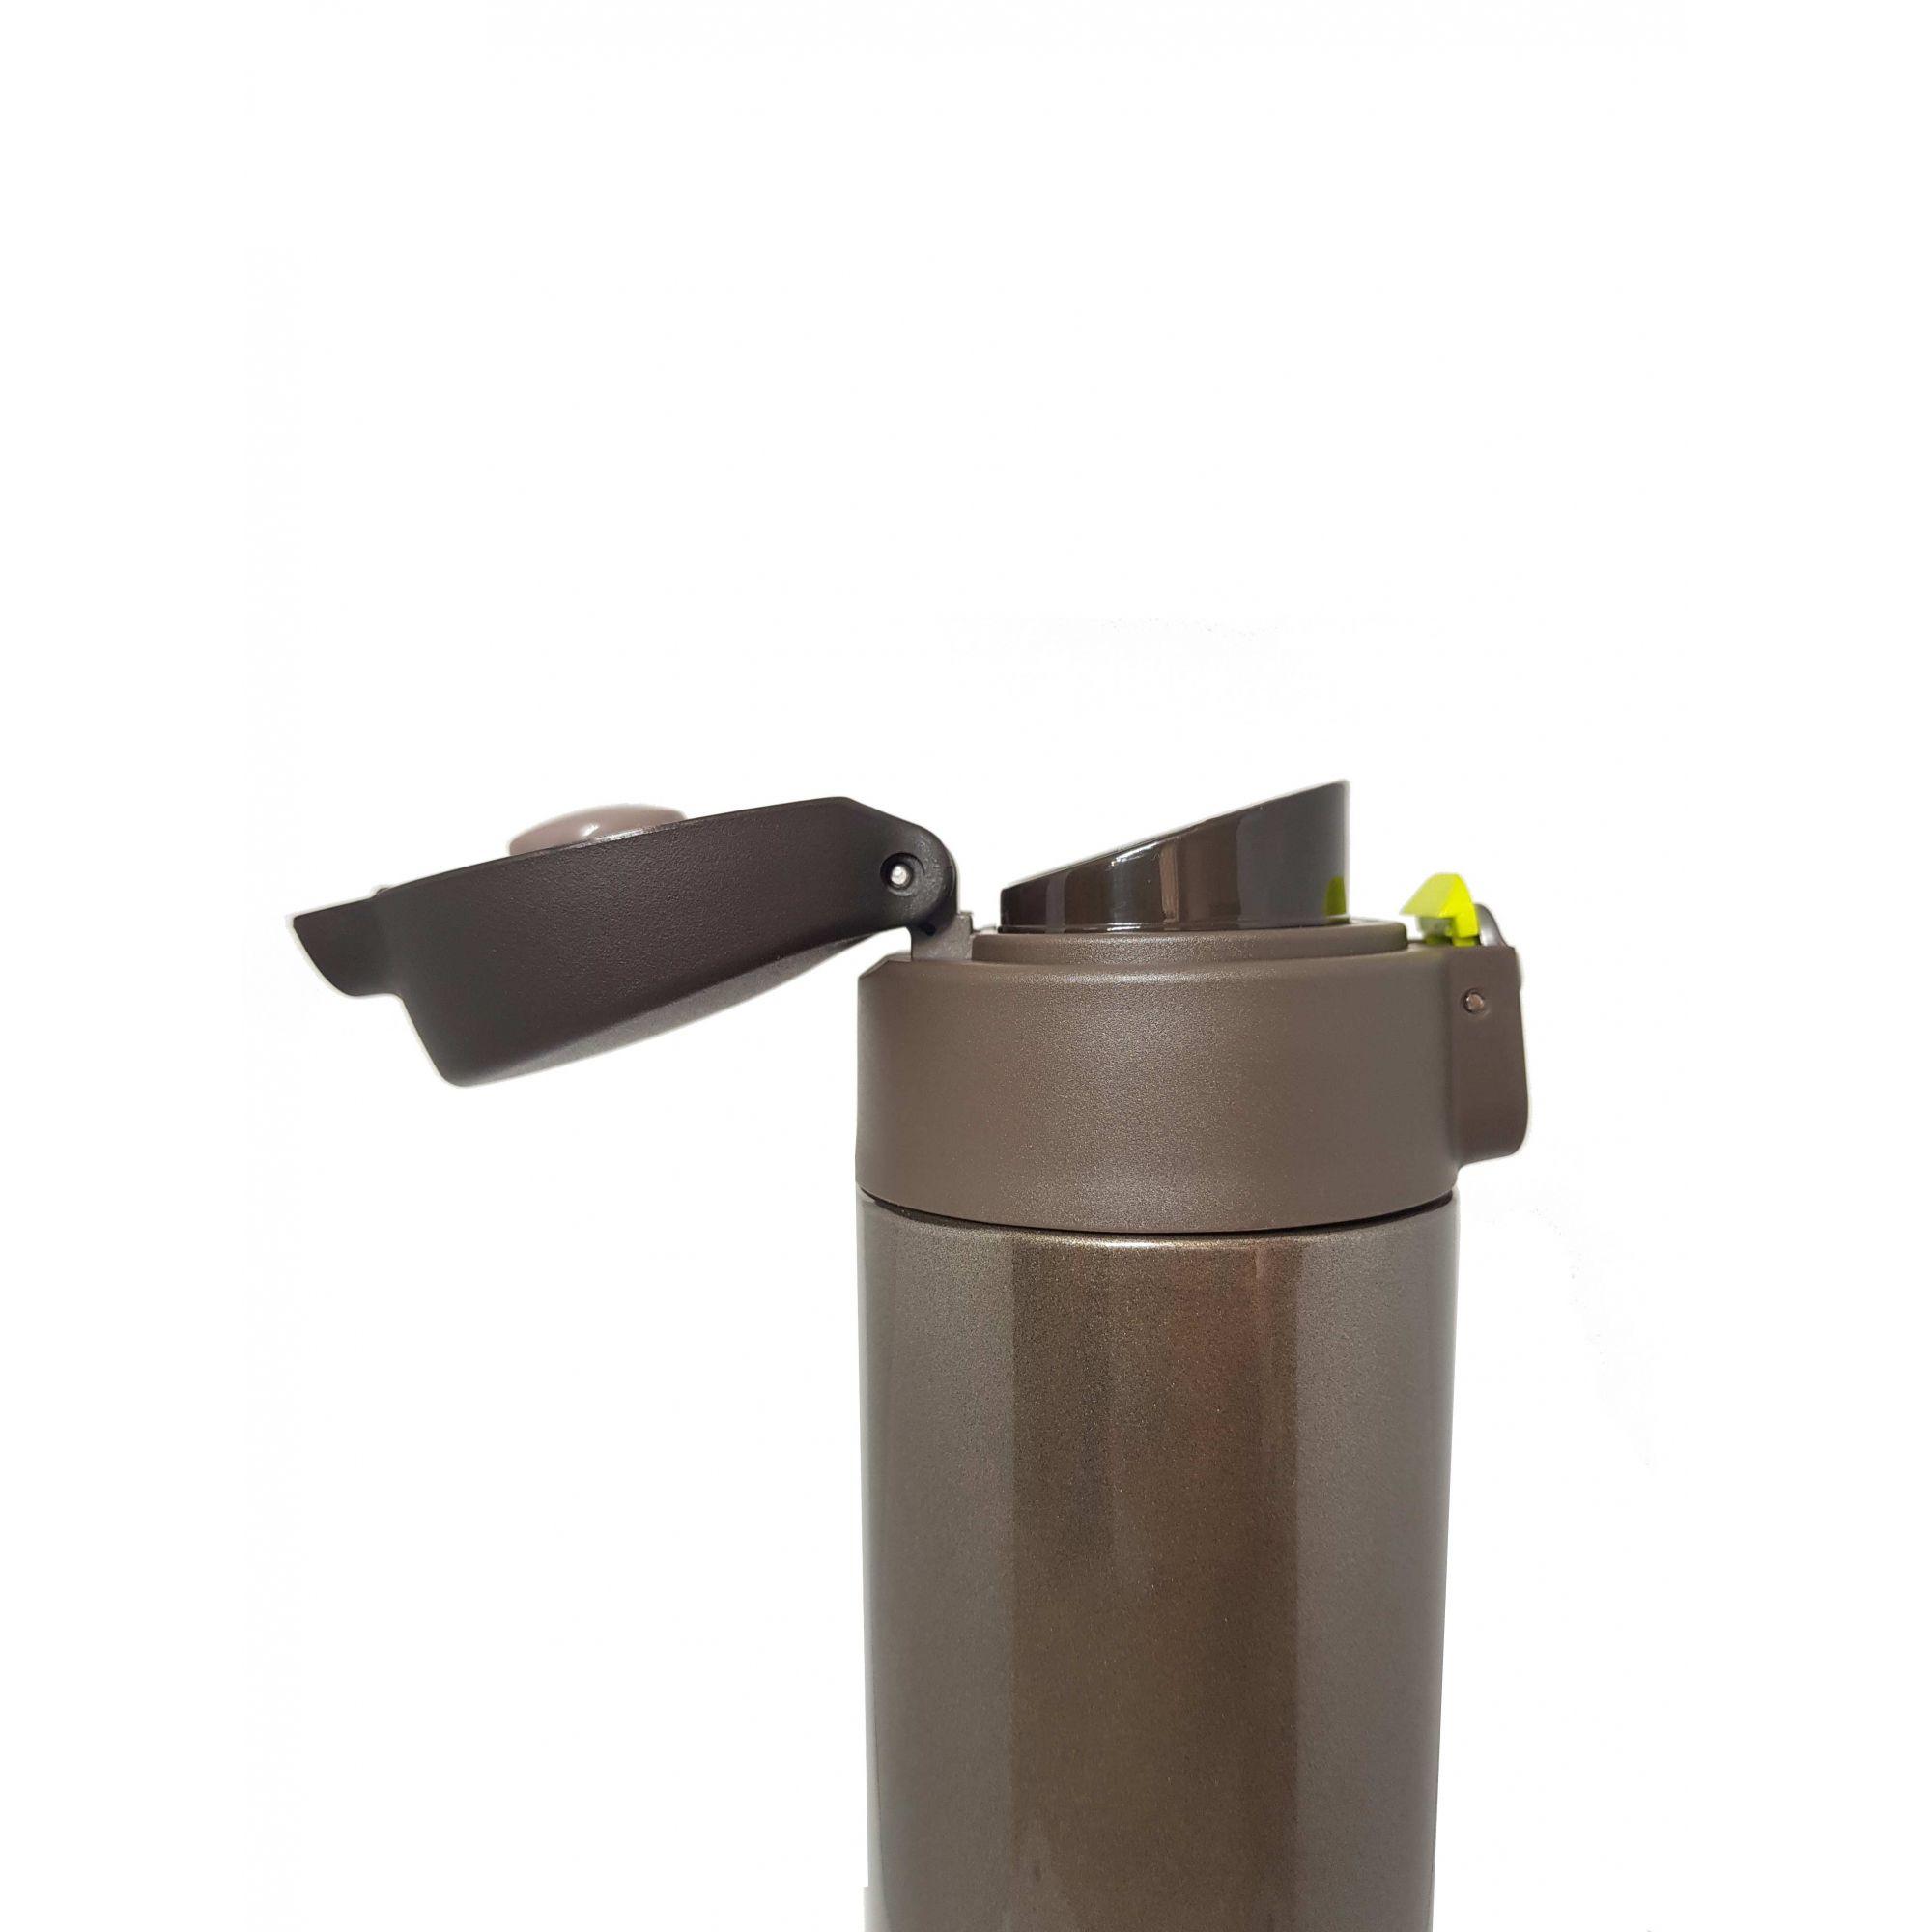 Kit Mundo Bolsa - 1 bolsa papel + garrafa inox 500 ml Marrom + kit 5 em 1 inox